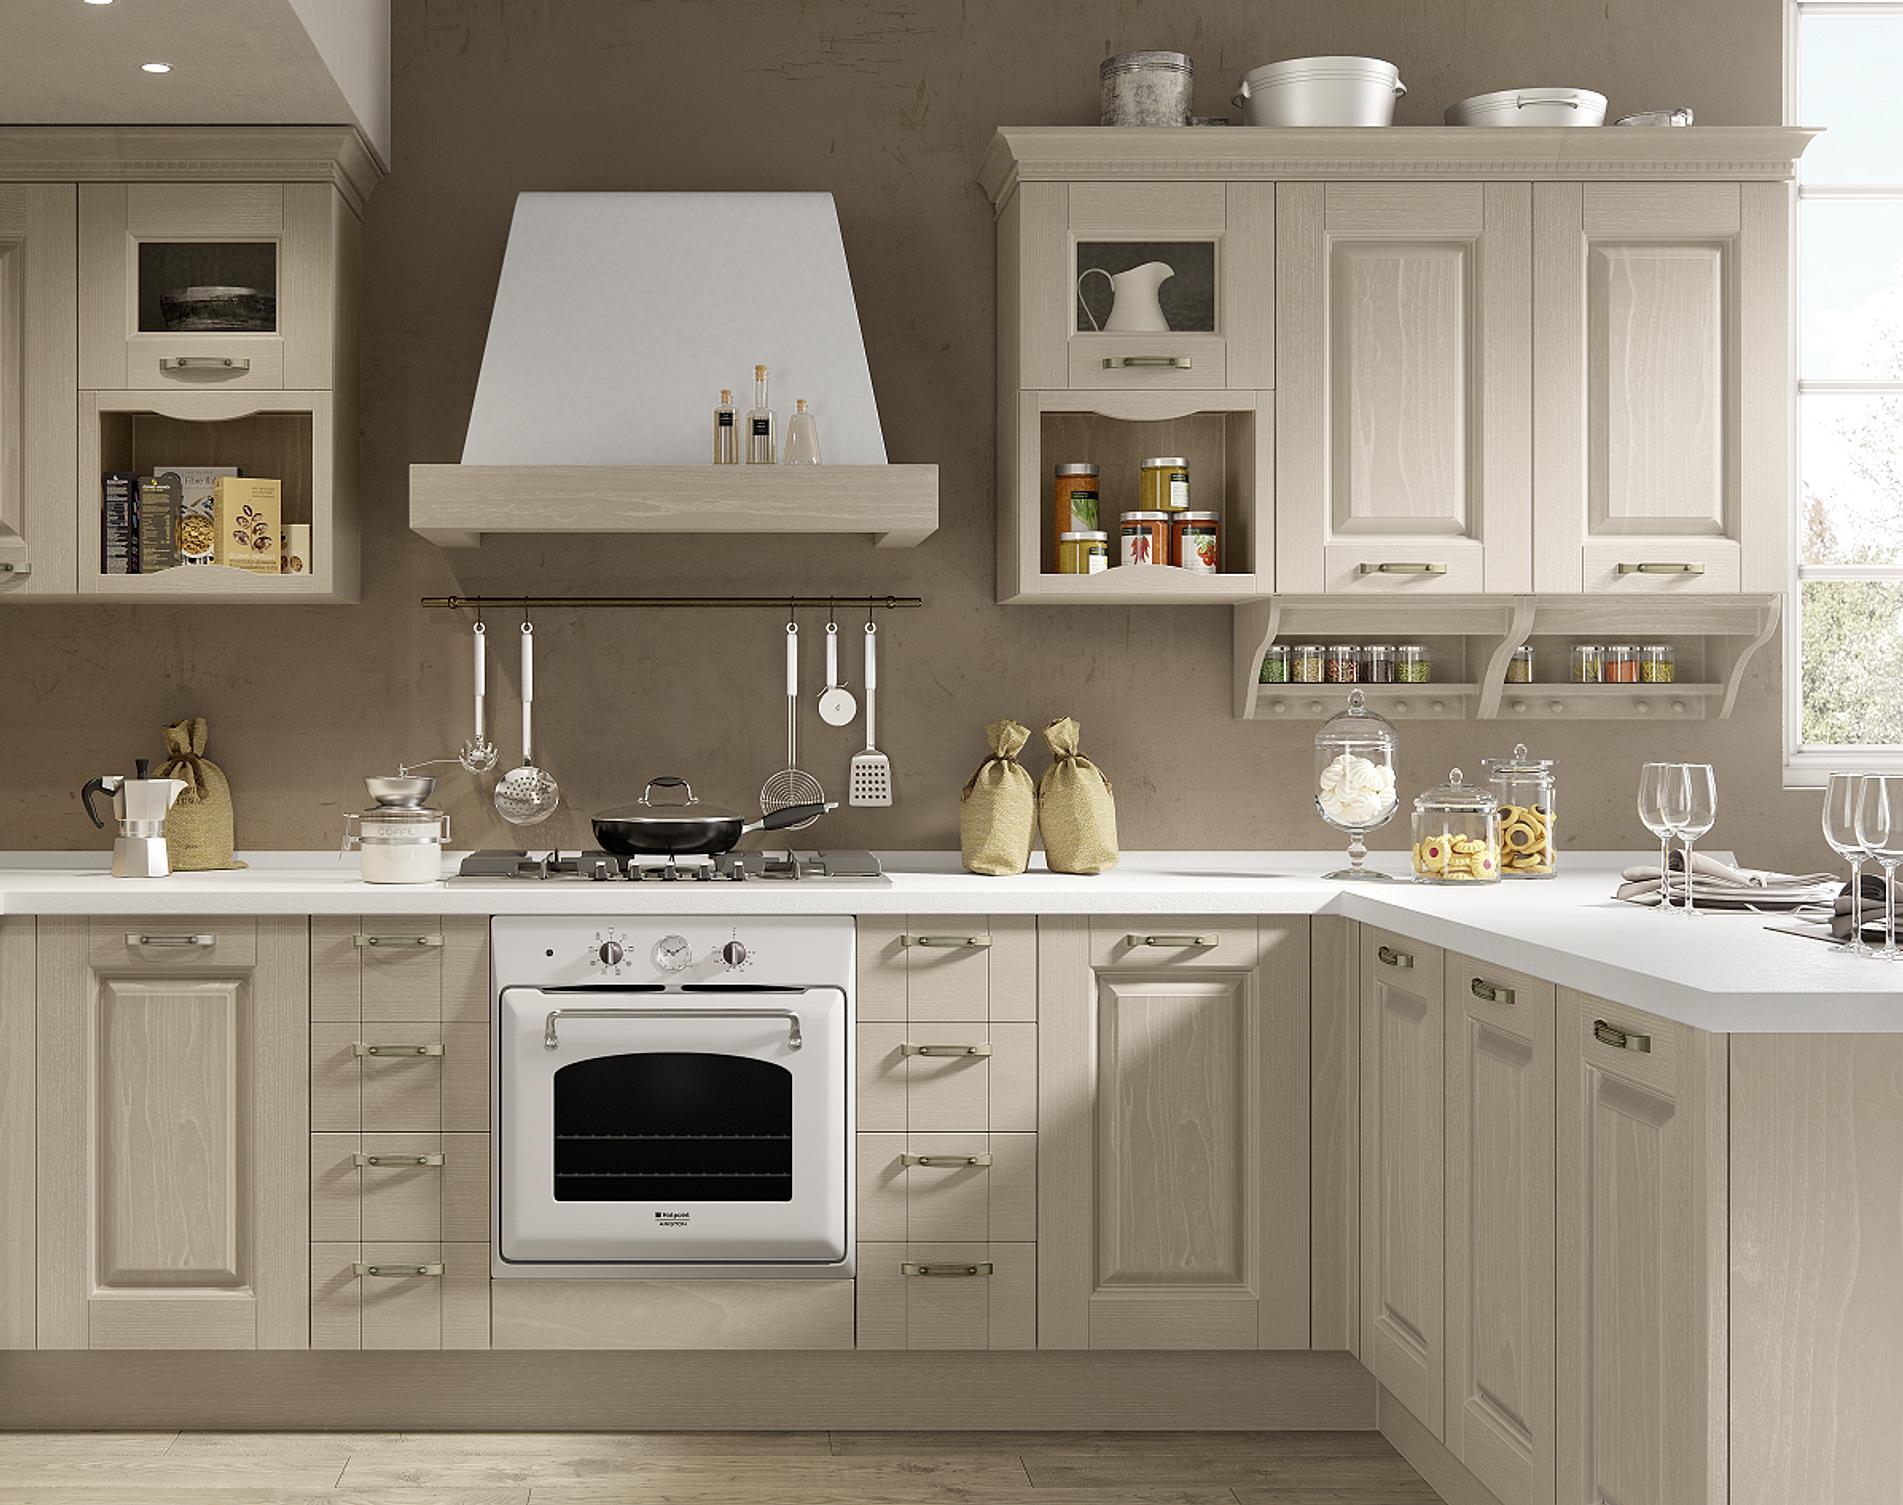 Awesome Ala Cucine Catalogo Photos - Home Design Ideas 2017 ...